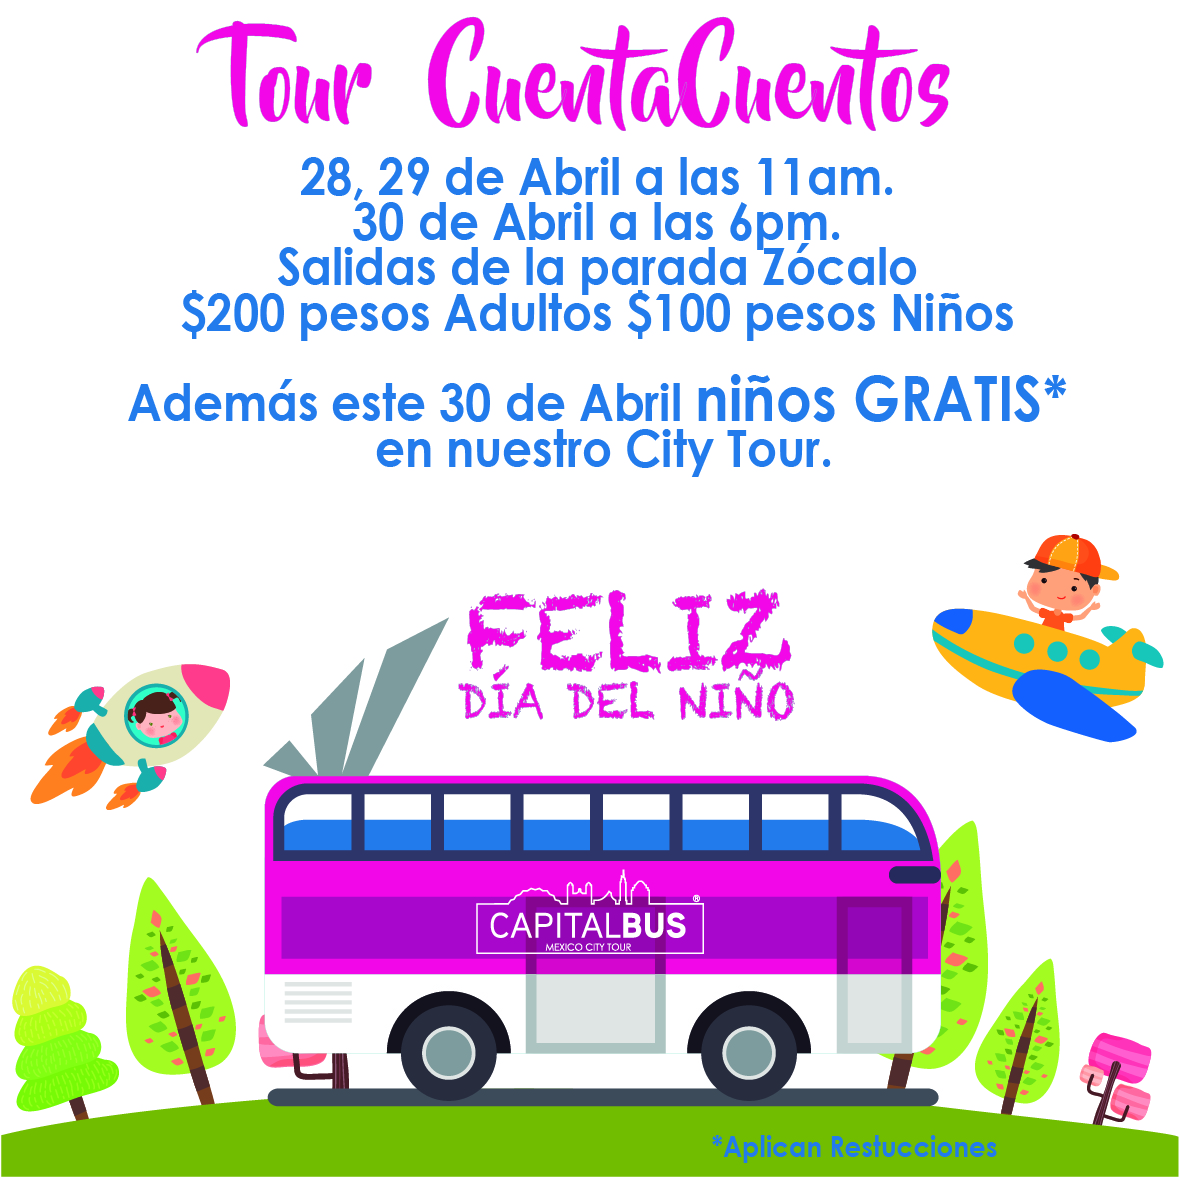 Tour Cuenta cuentos-01.jpg